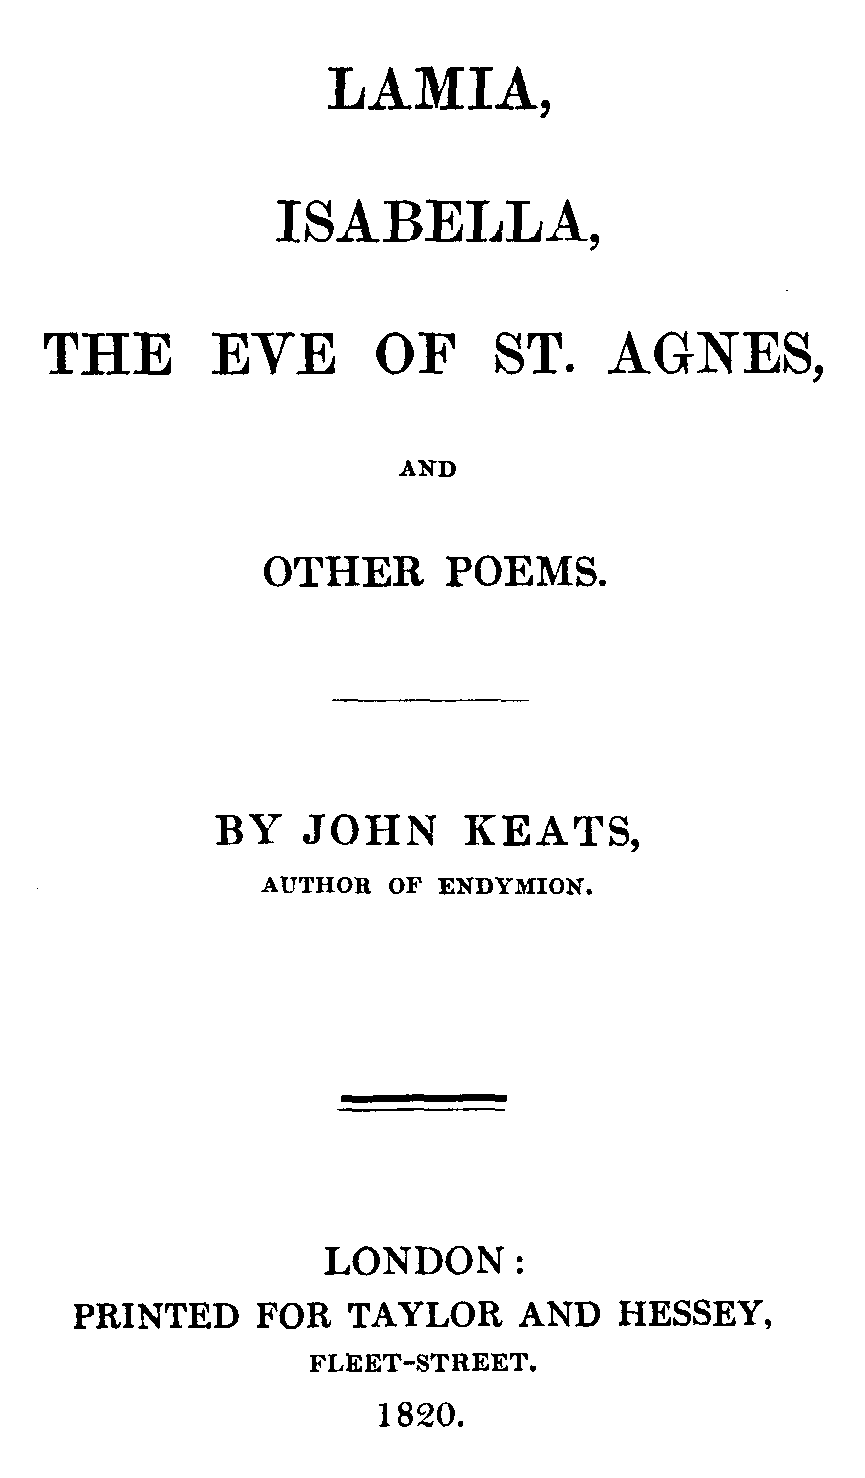 isabella john keats